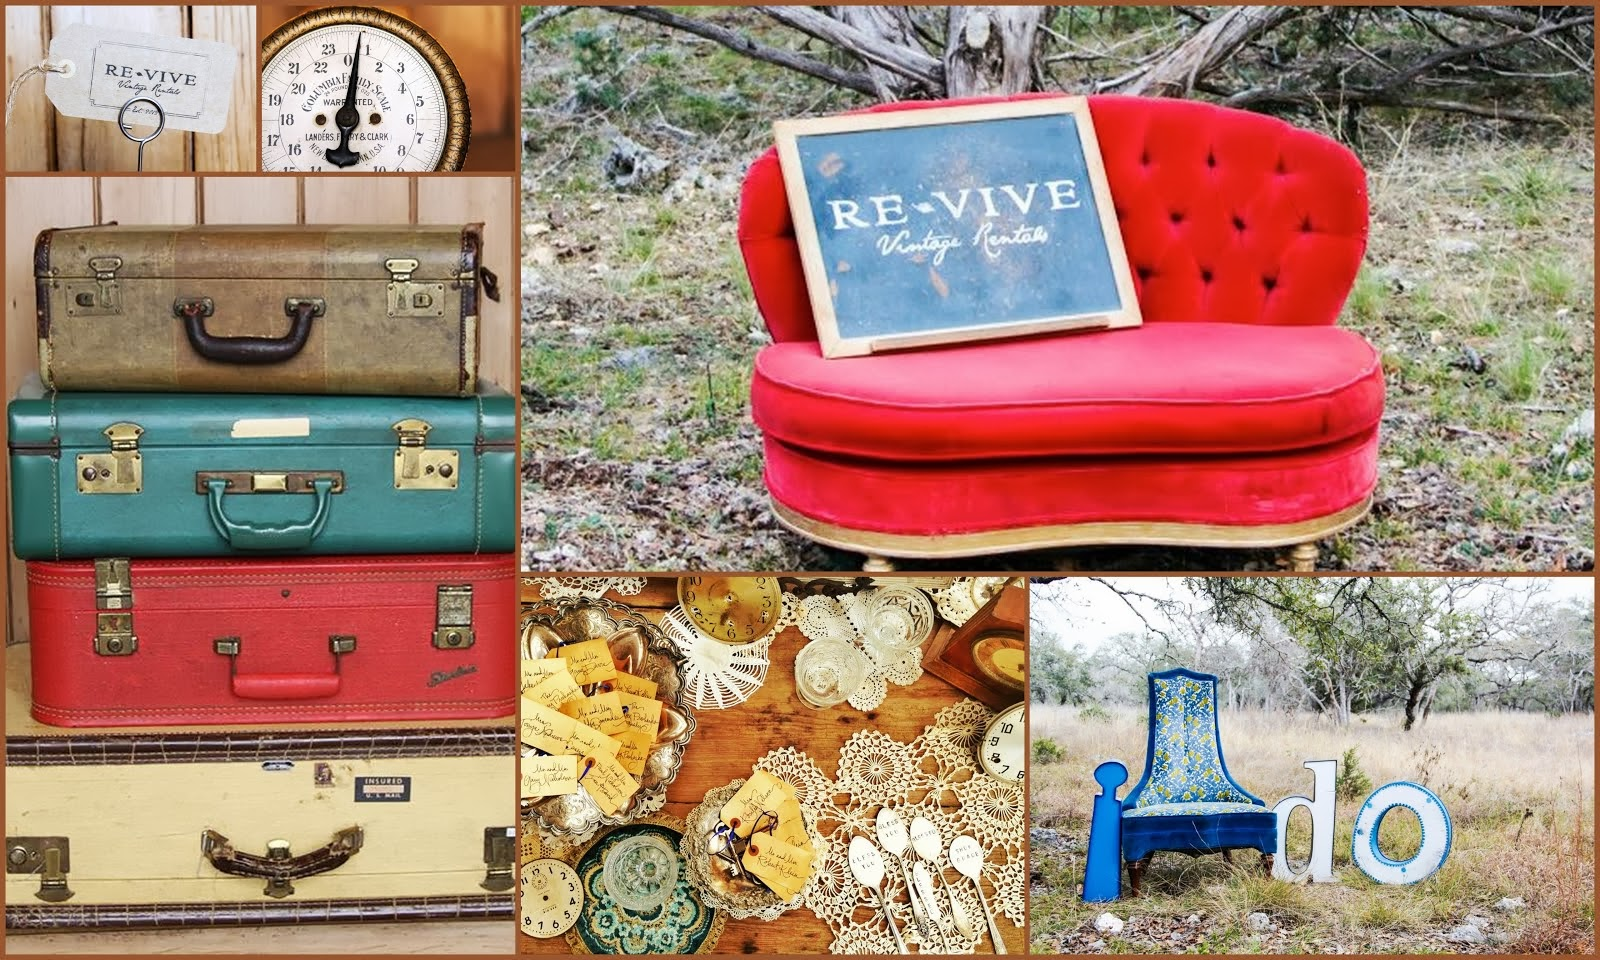 Revive Vintage Rentals